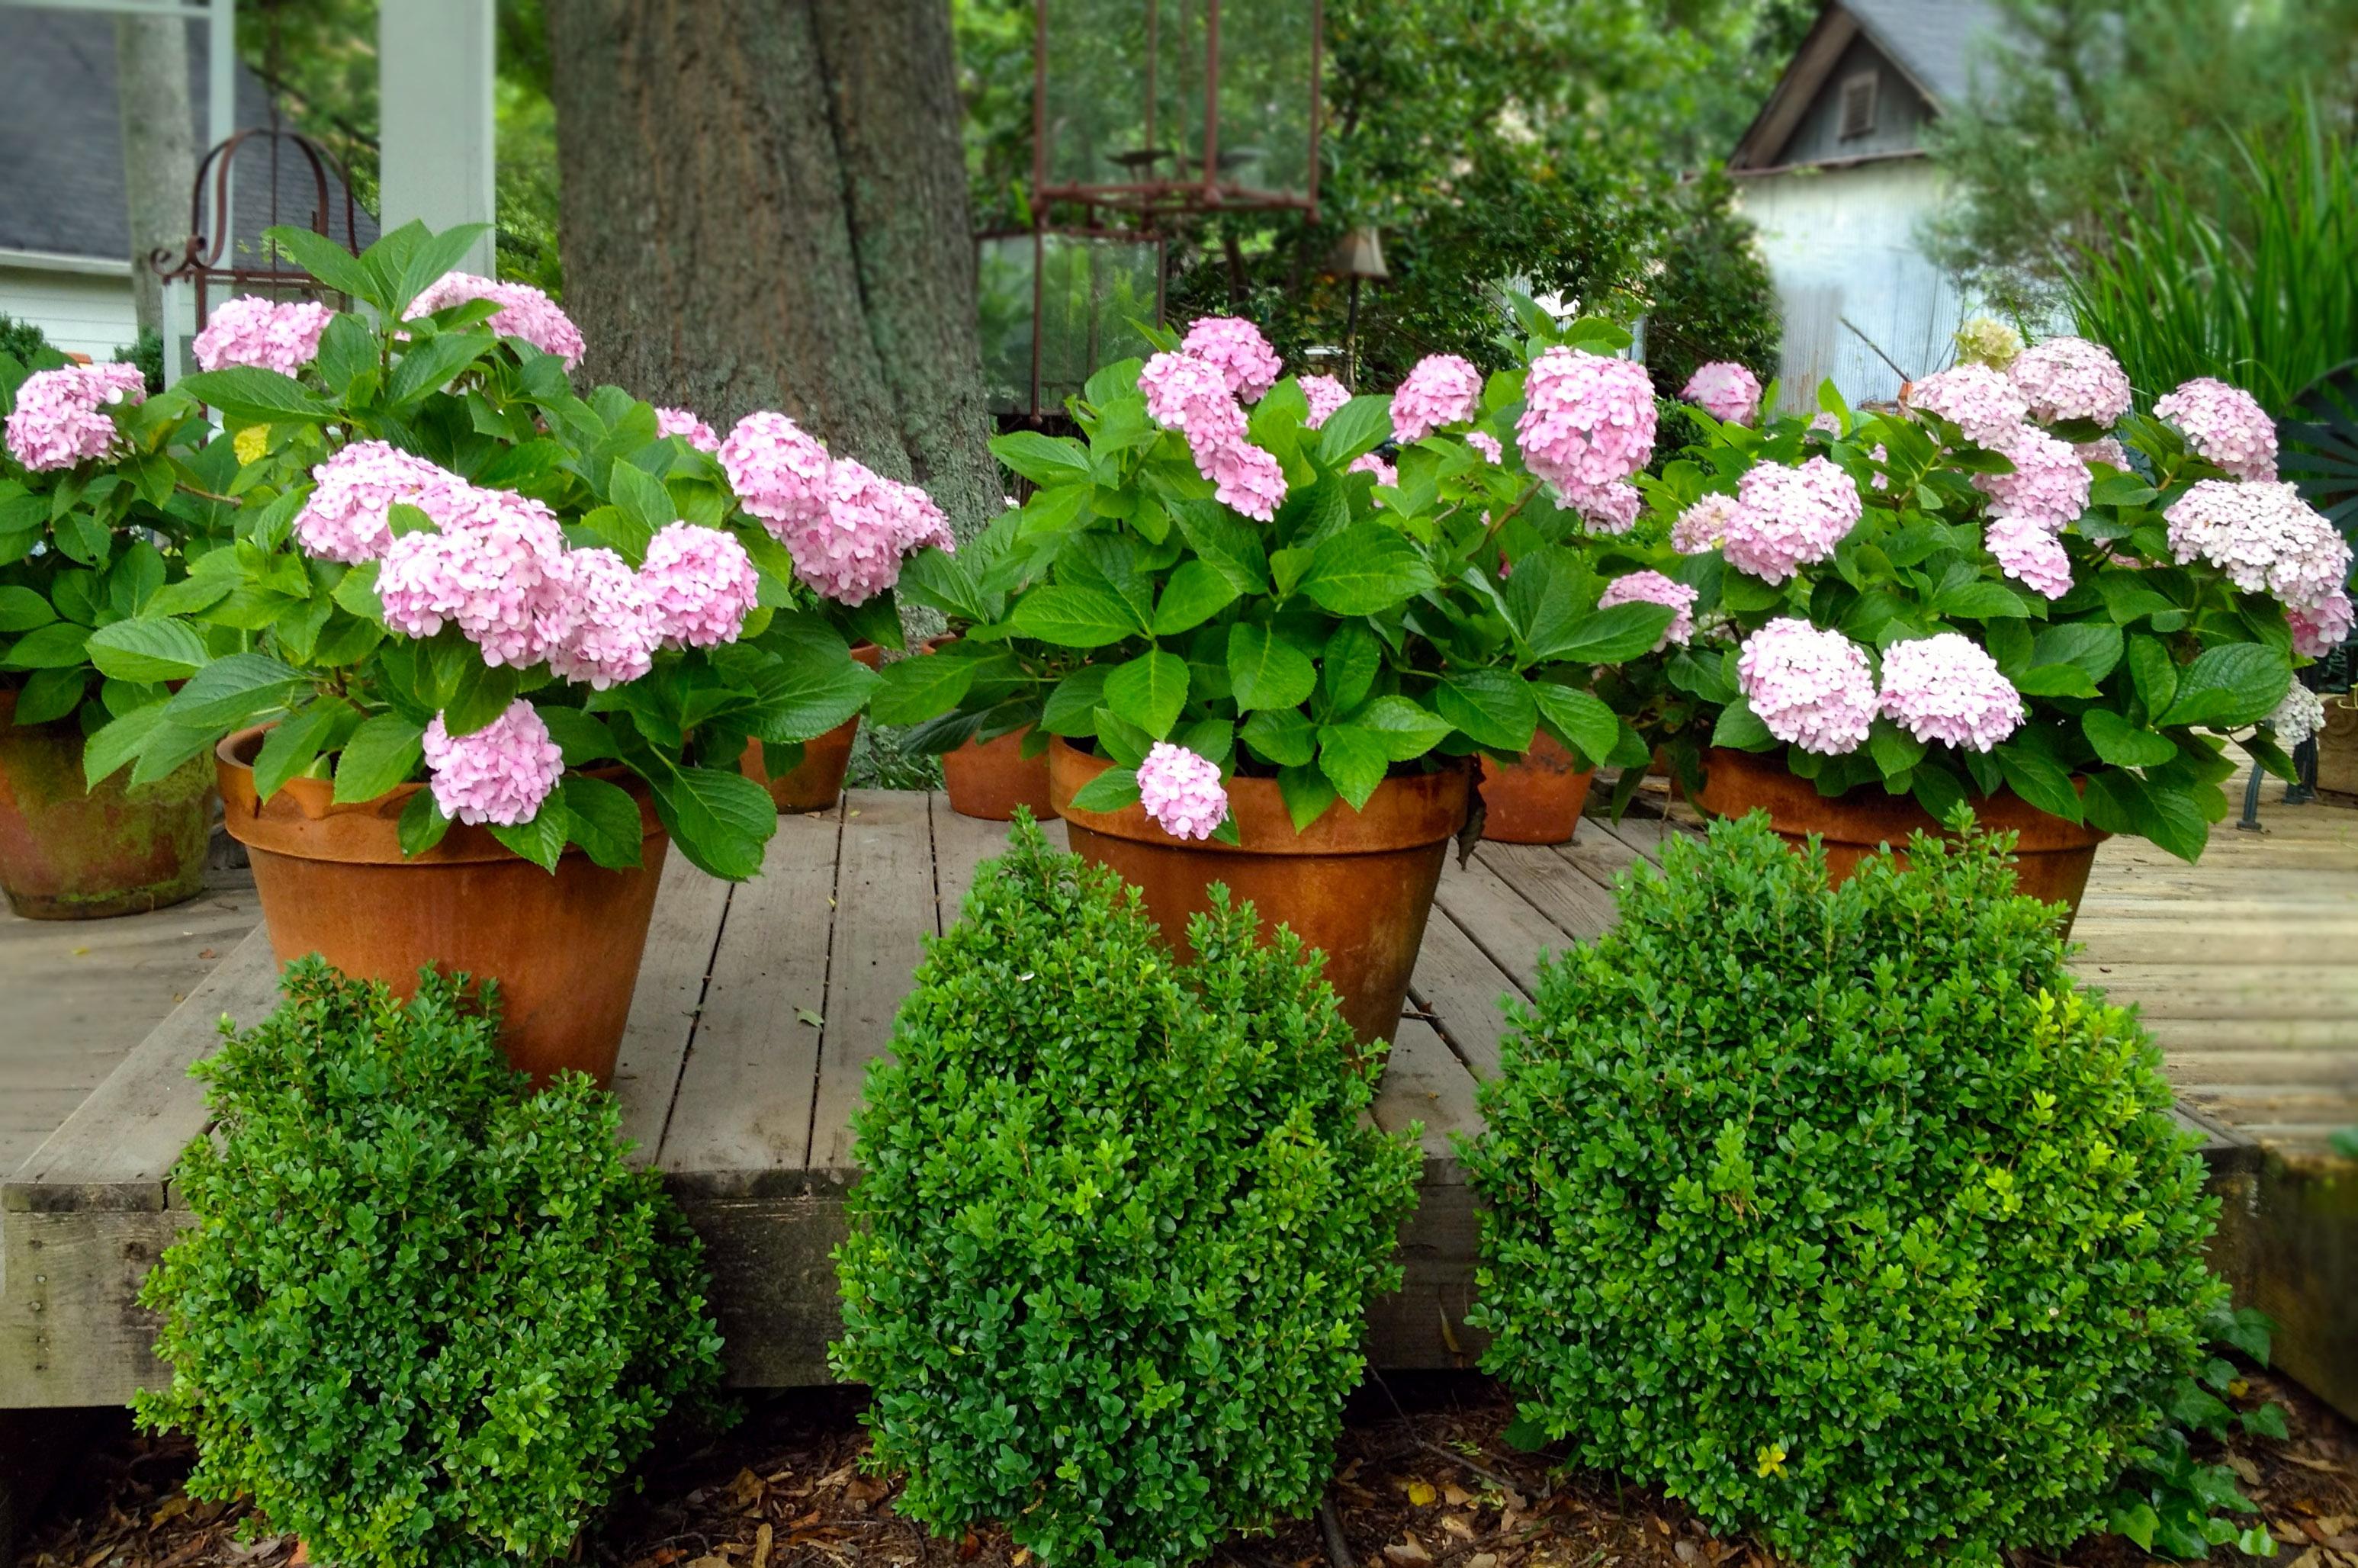 Hortenzijos vazone